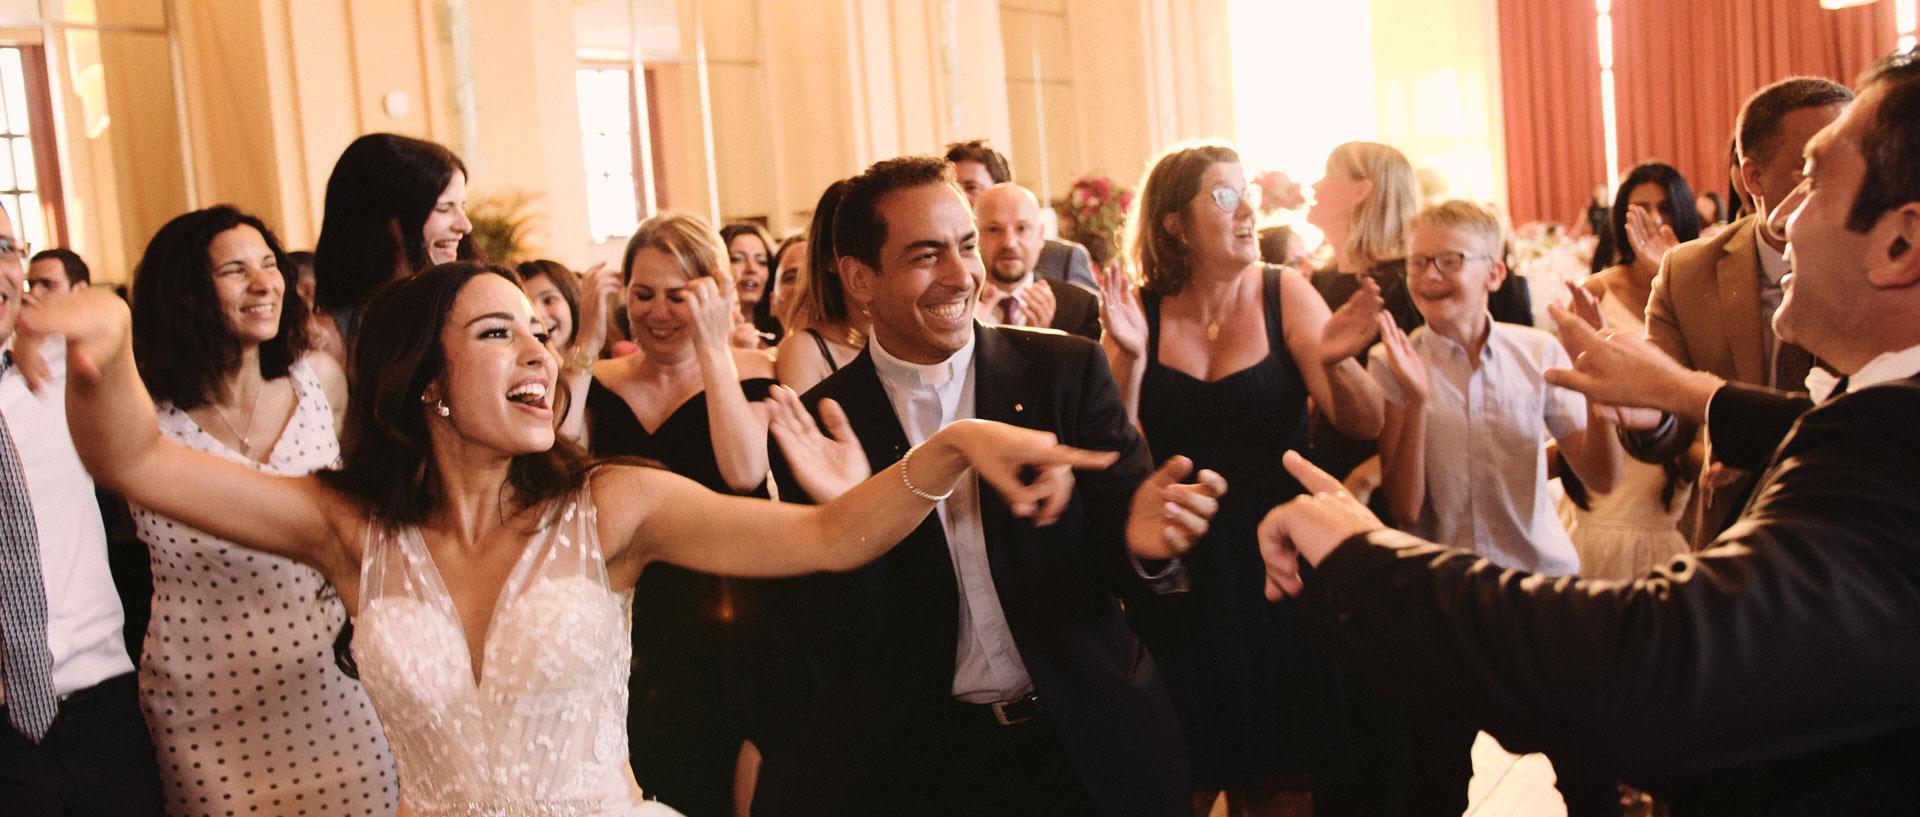 Natasha & Jad Wedding - Casino Biarritz (42).jpg